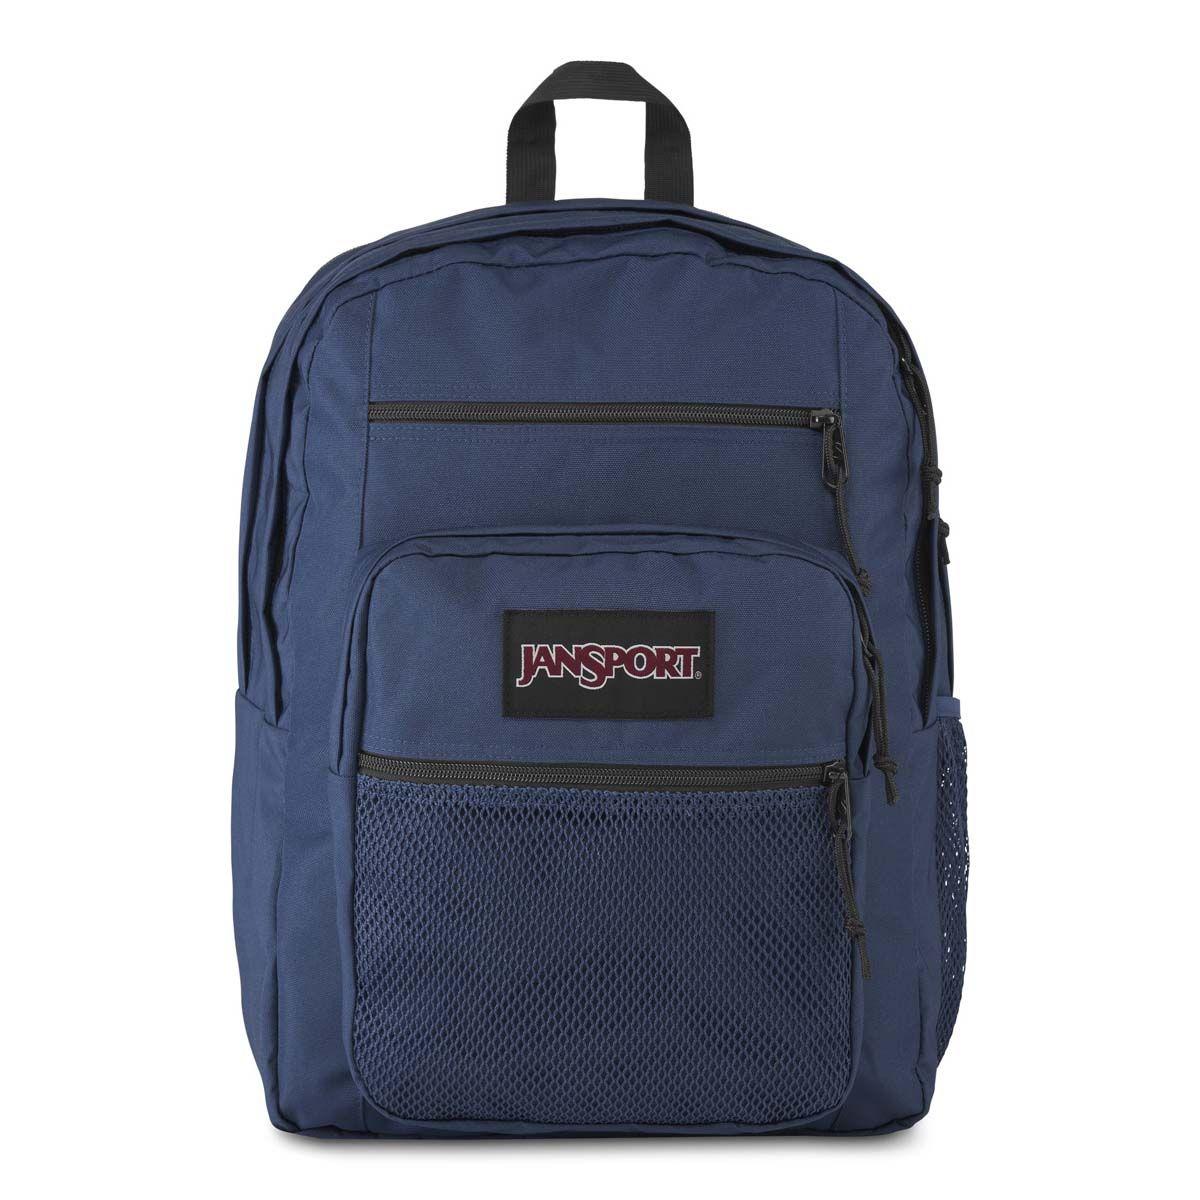 JanSport Big Campus Backpack in Navy